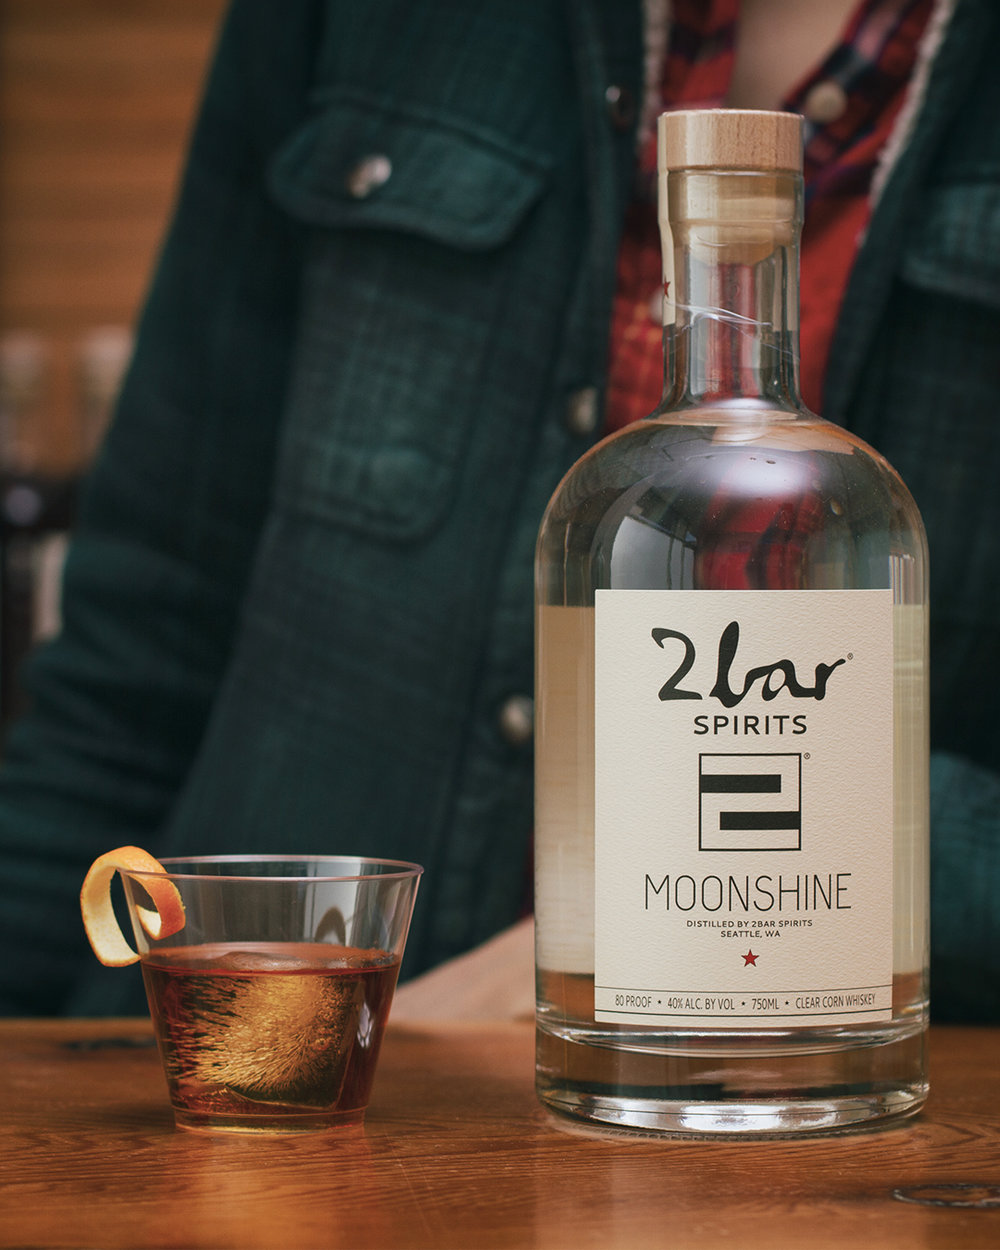 2bar_moonshine.jpg